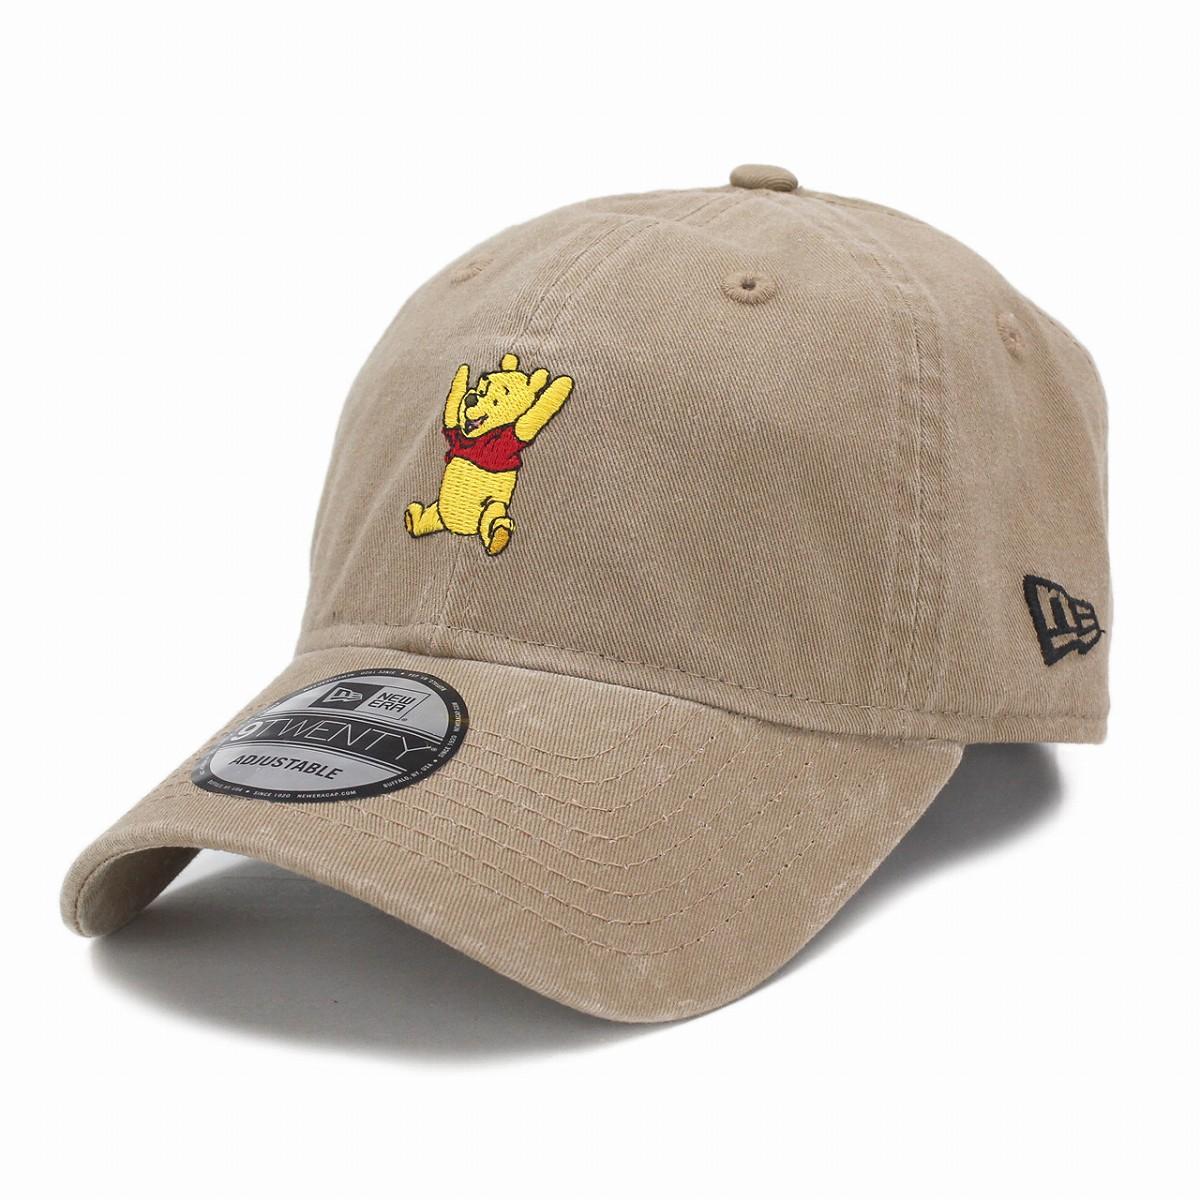 759130214b1f newera disney collaboration Winnie-the-Pooh cap new gills Pooh hat Disney  DISNEY collaboration cap 9TWENTY pooh baseball cap men baseball cap  character ...